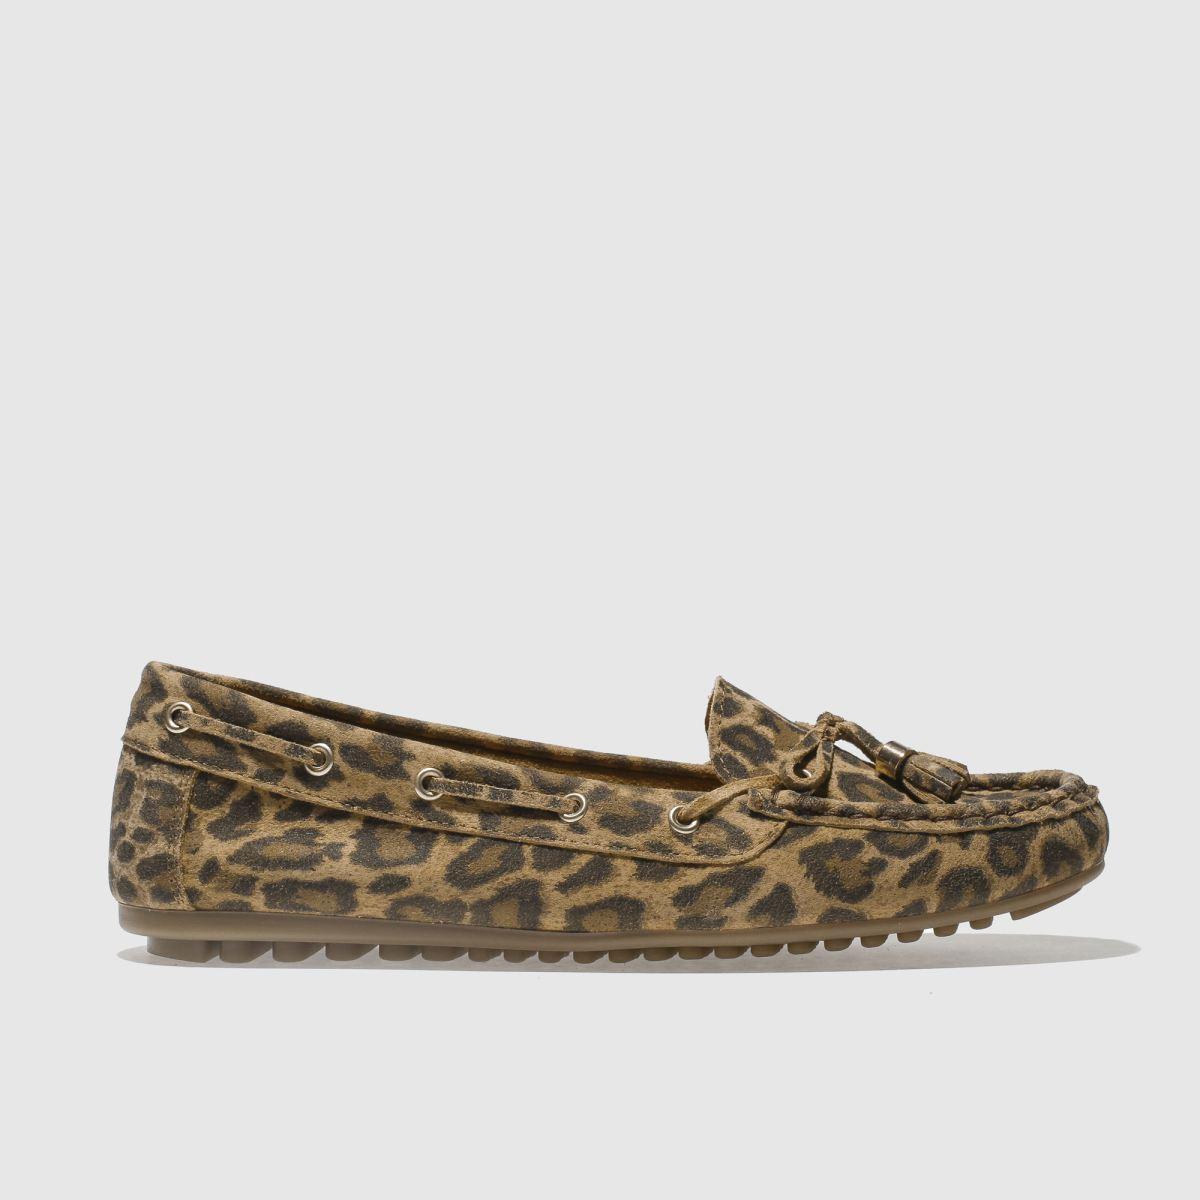 Schuh Beige & Brown Spin Around Flat Shoes